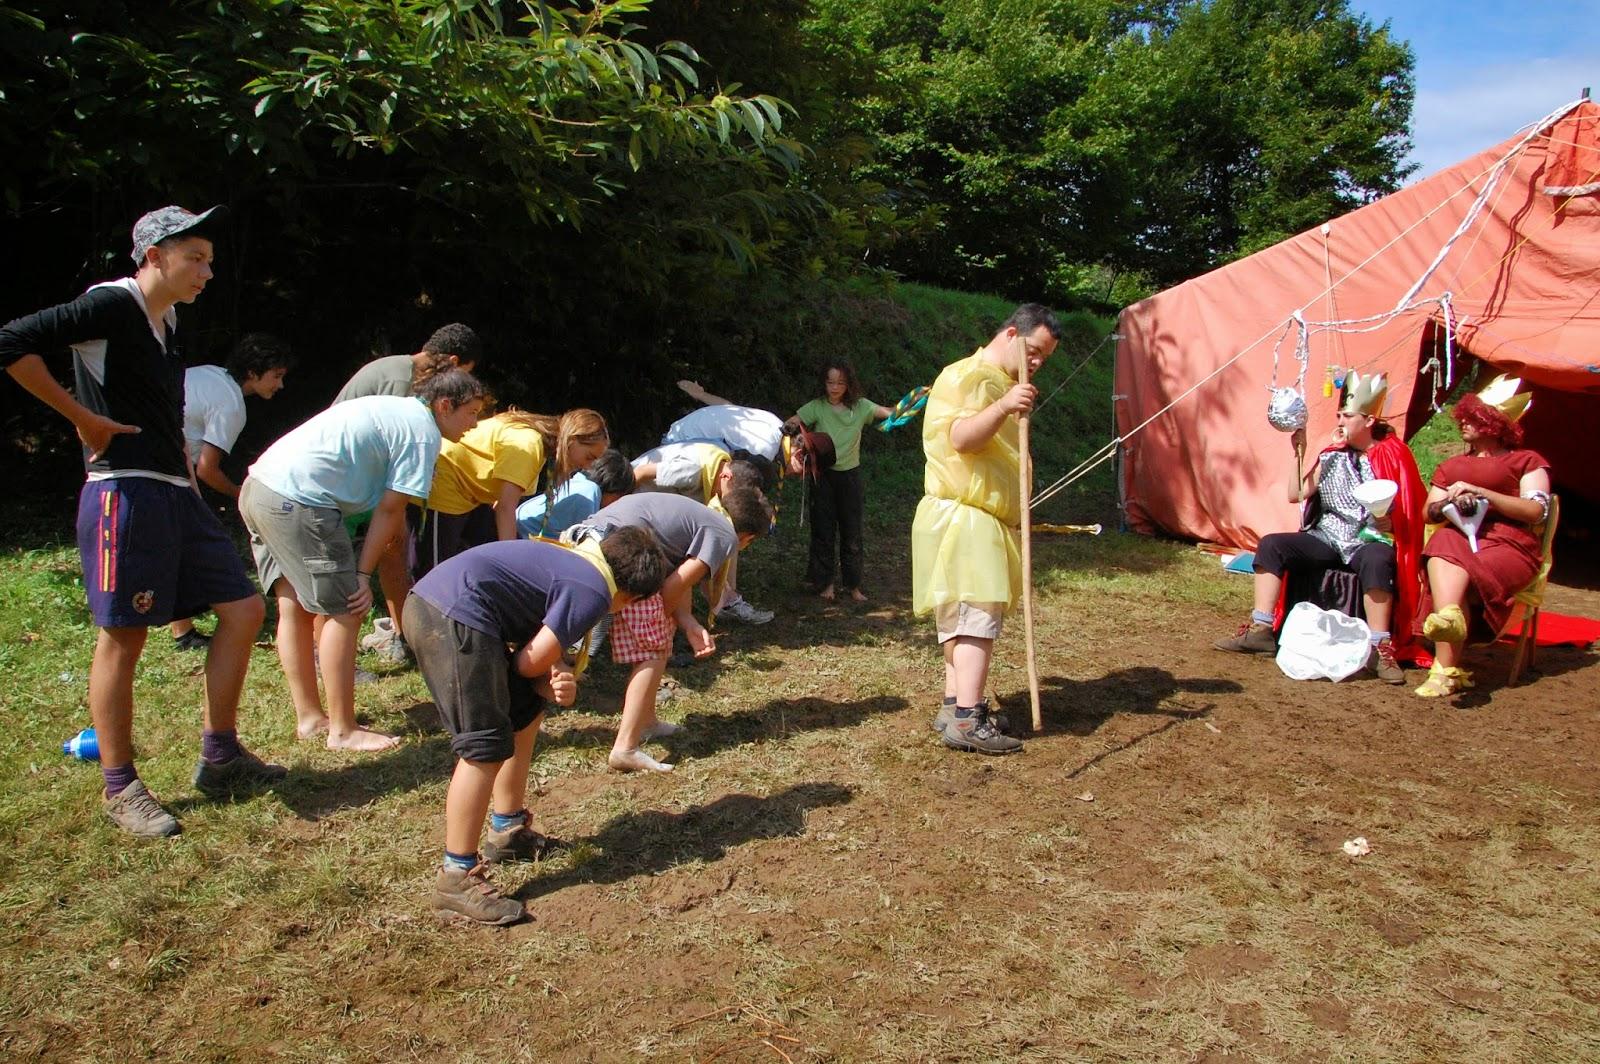 Campaments Estiu RolandKing 2011 - DSC_0203.JPG